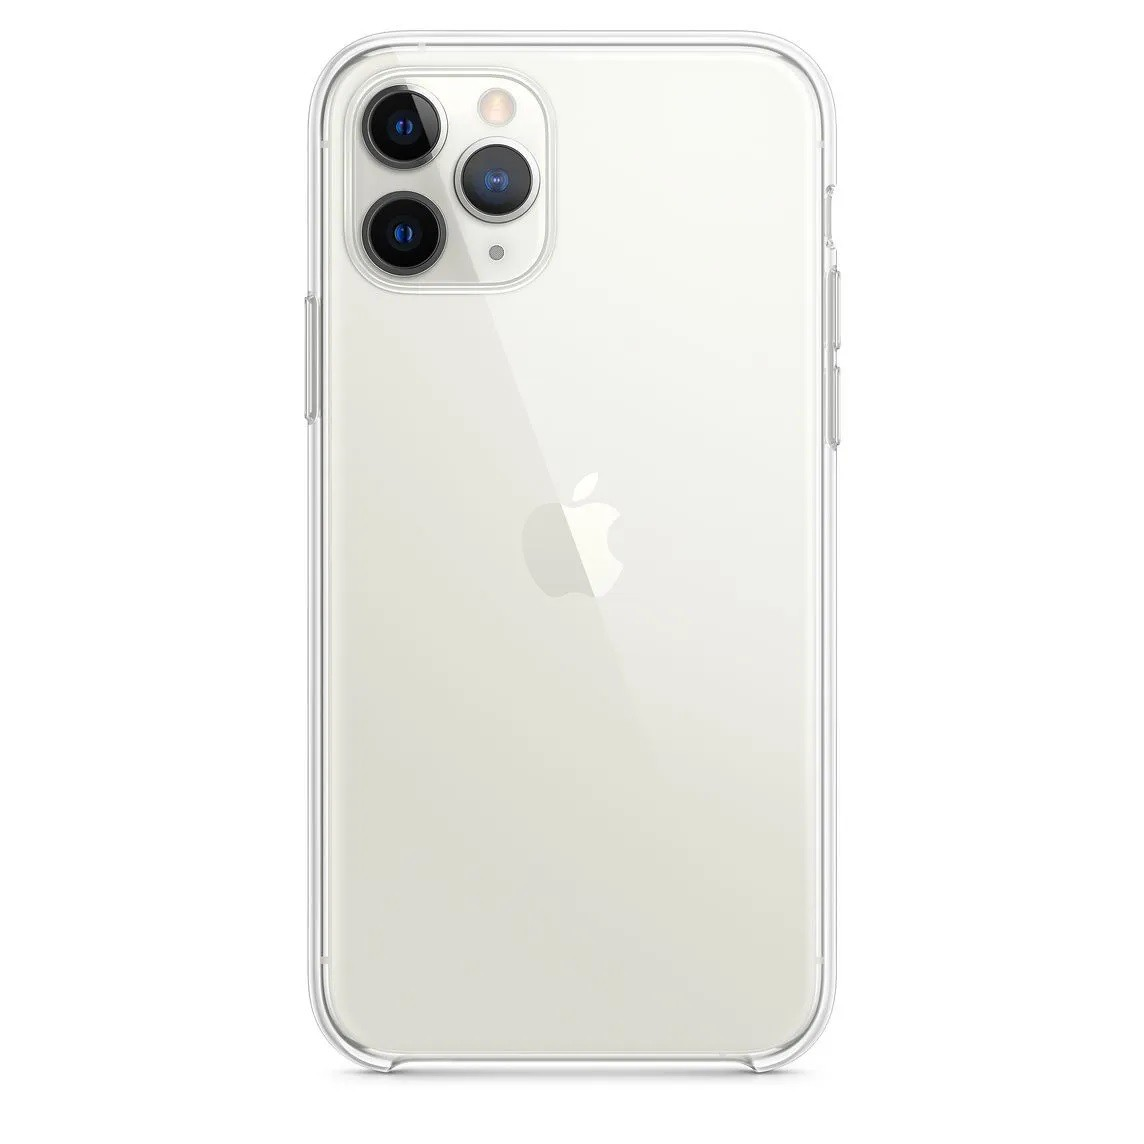 Capinha Anti-Shock + Película 5D Vidro Iphone 11, Pro, Pro Max